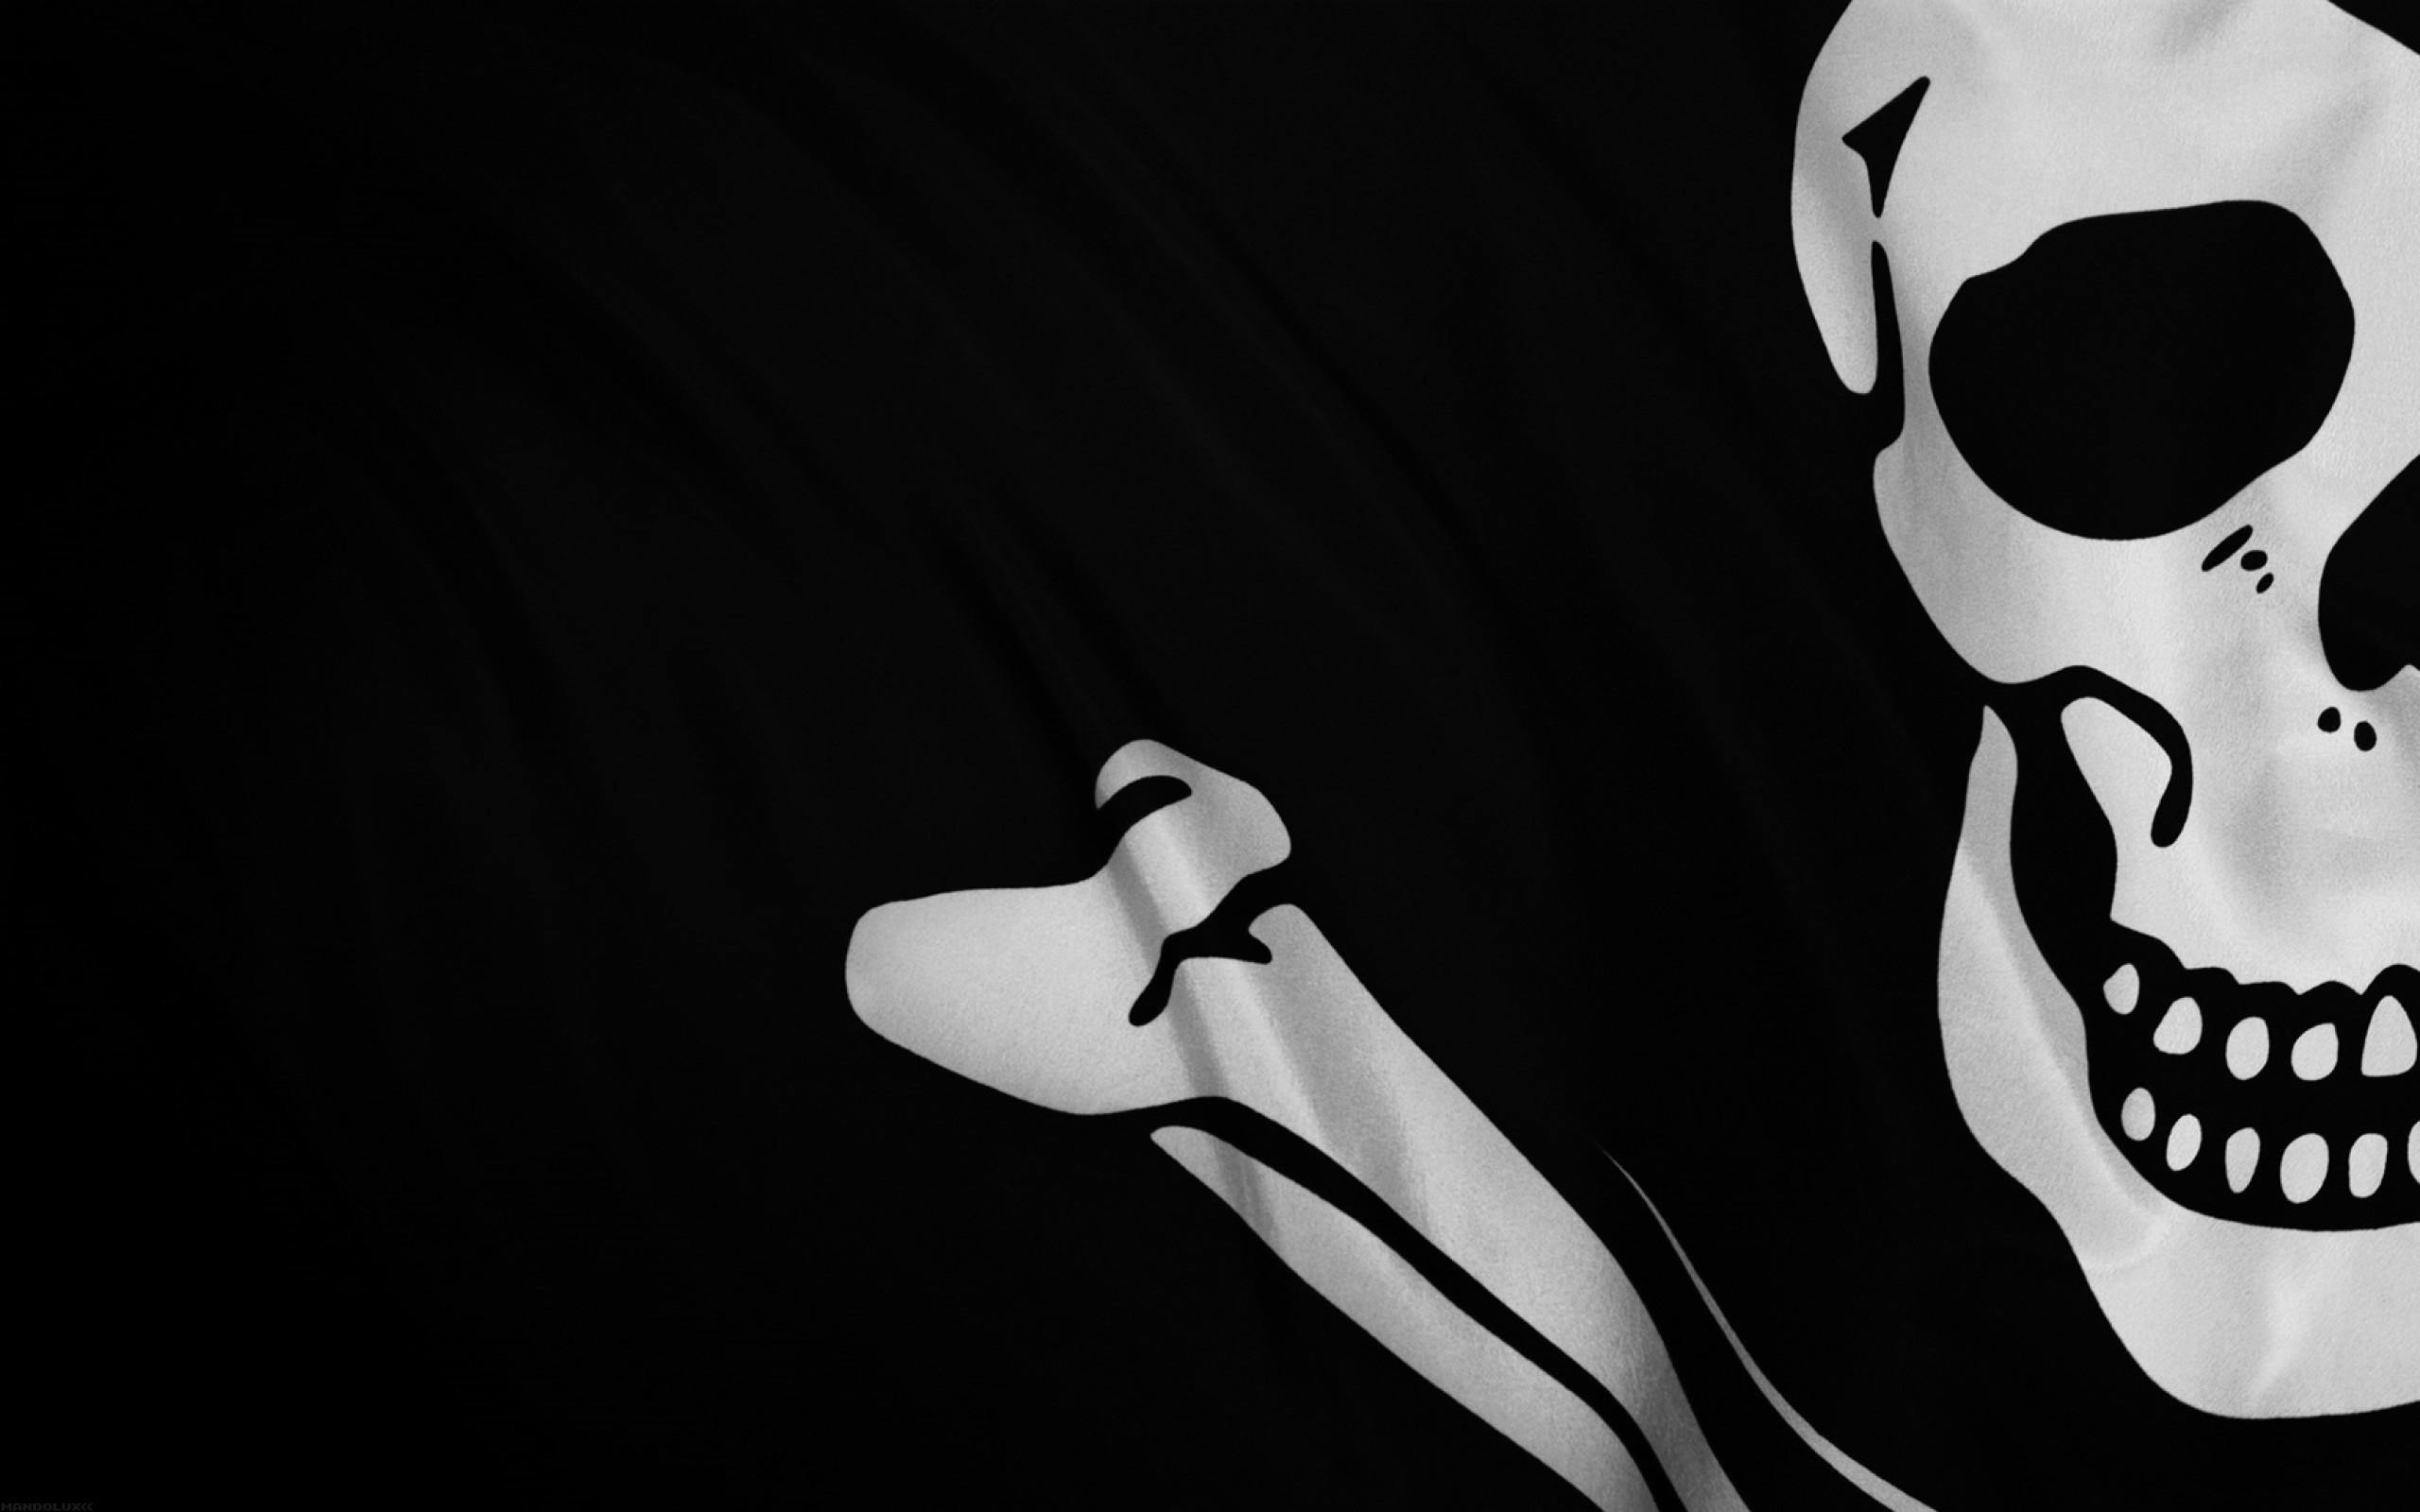 skulls pirates flags skull and crossbones 3360×1050 wallpaper Art HD  Wallpaper